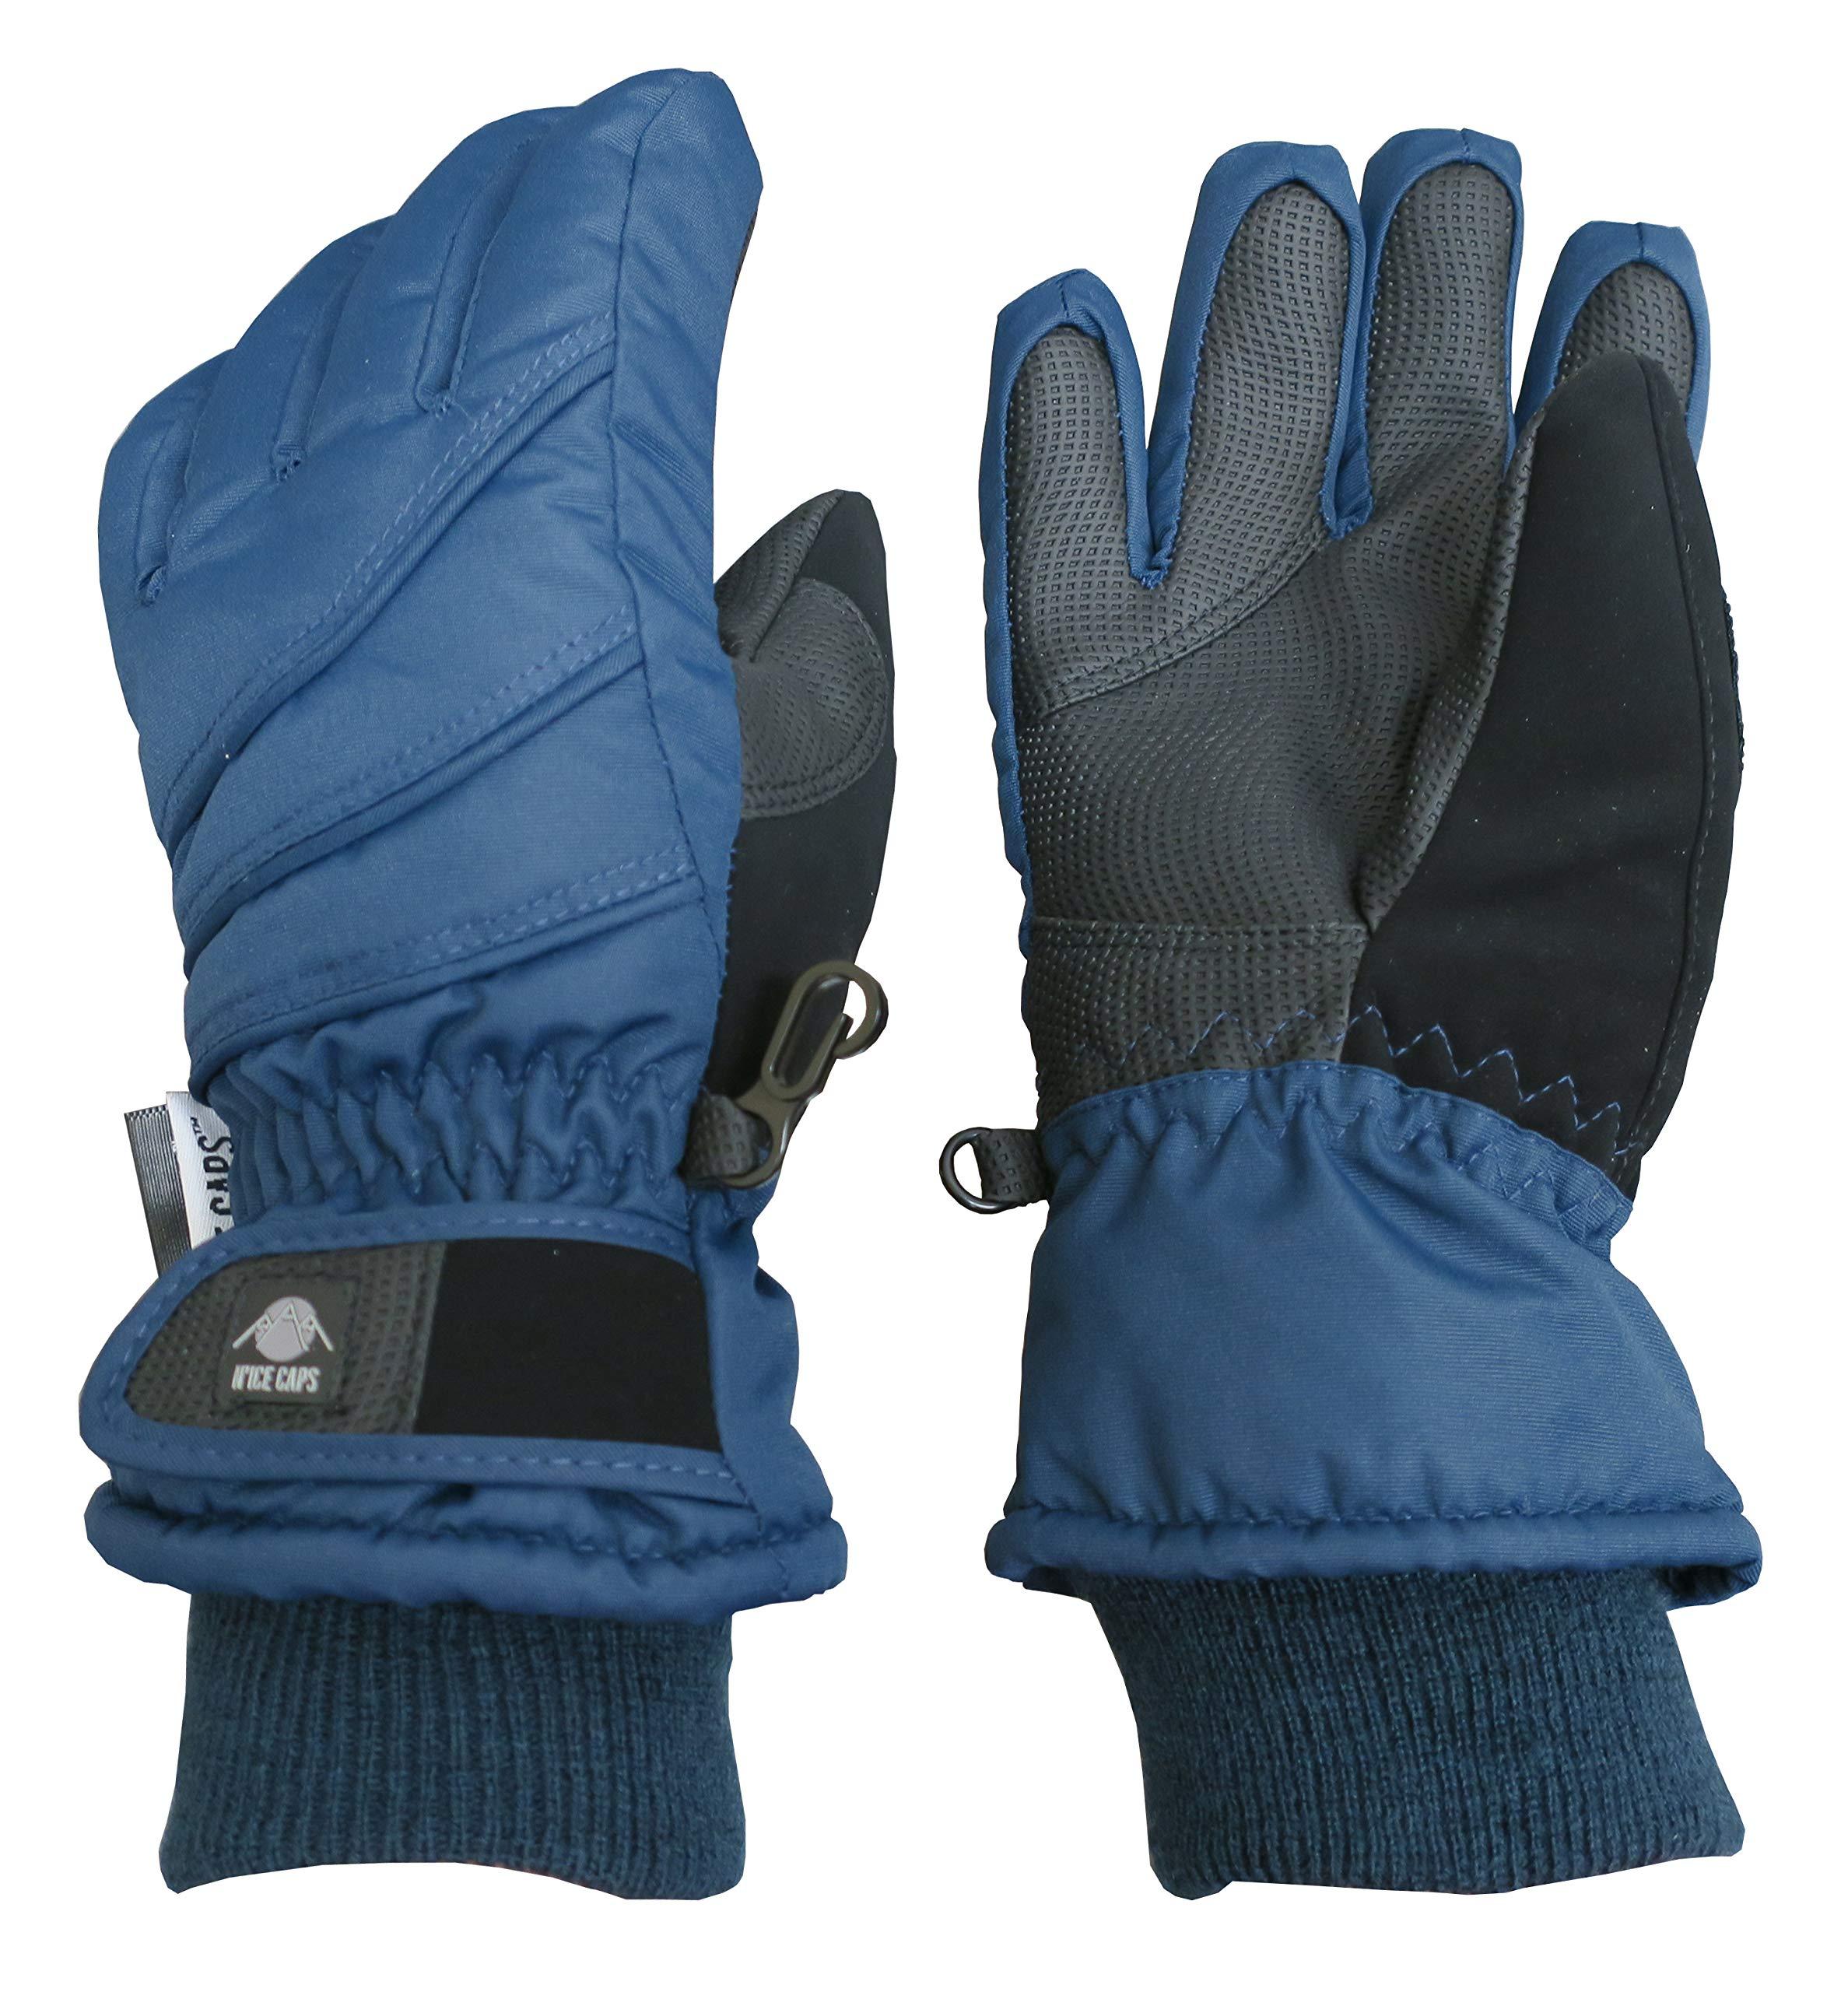 N'Ice Caps Kids Bulky Thinsulate Waterproof Winter Snow Ski Glove With Ridges (Navy, 3-4yrs)